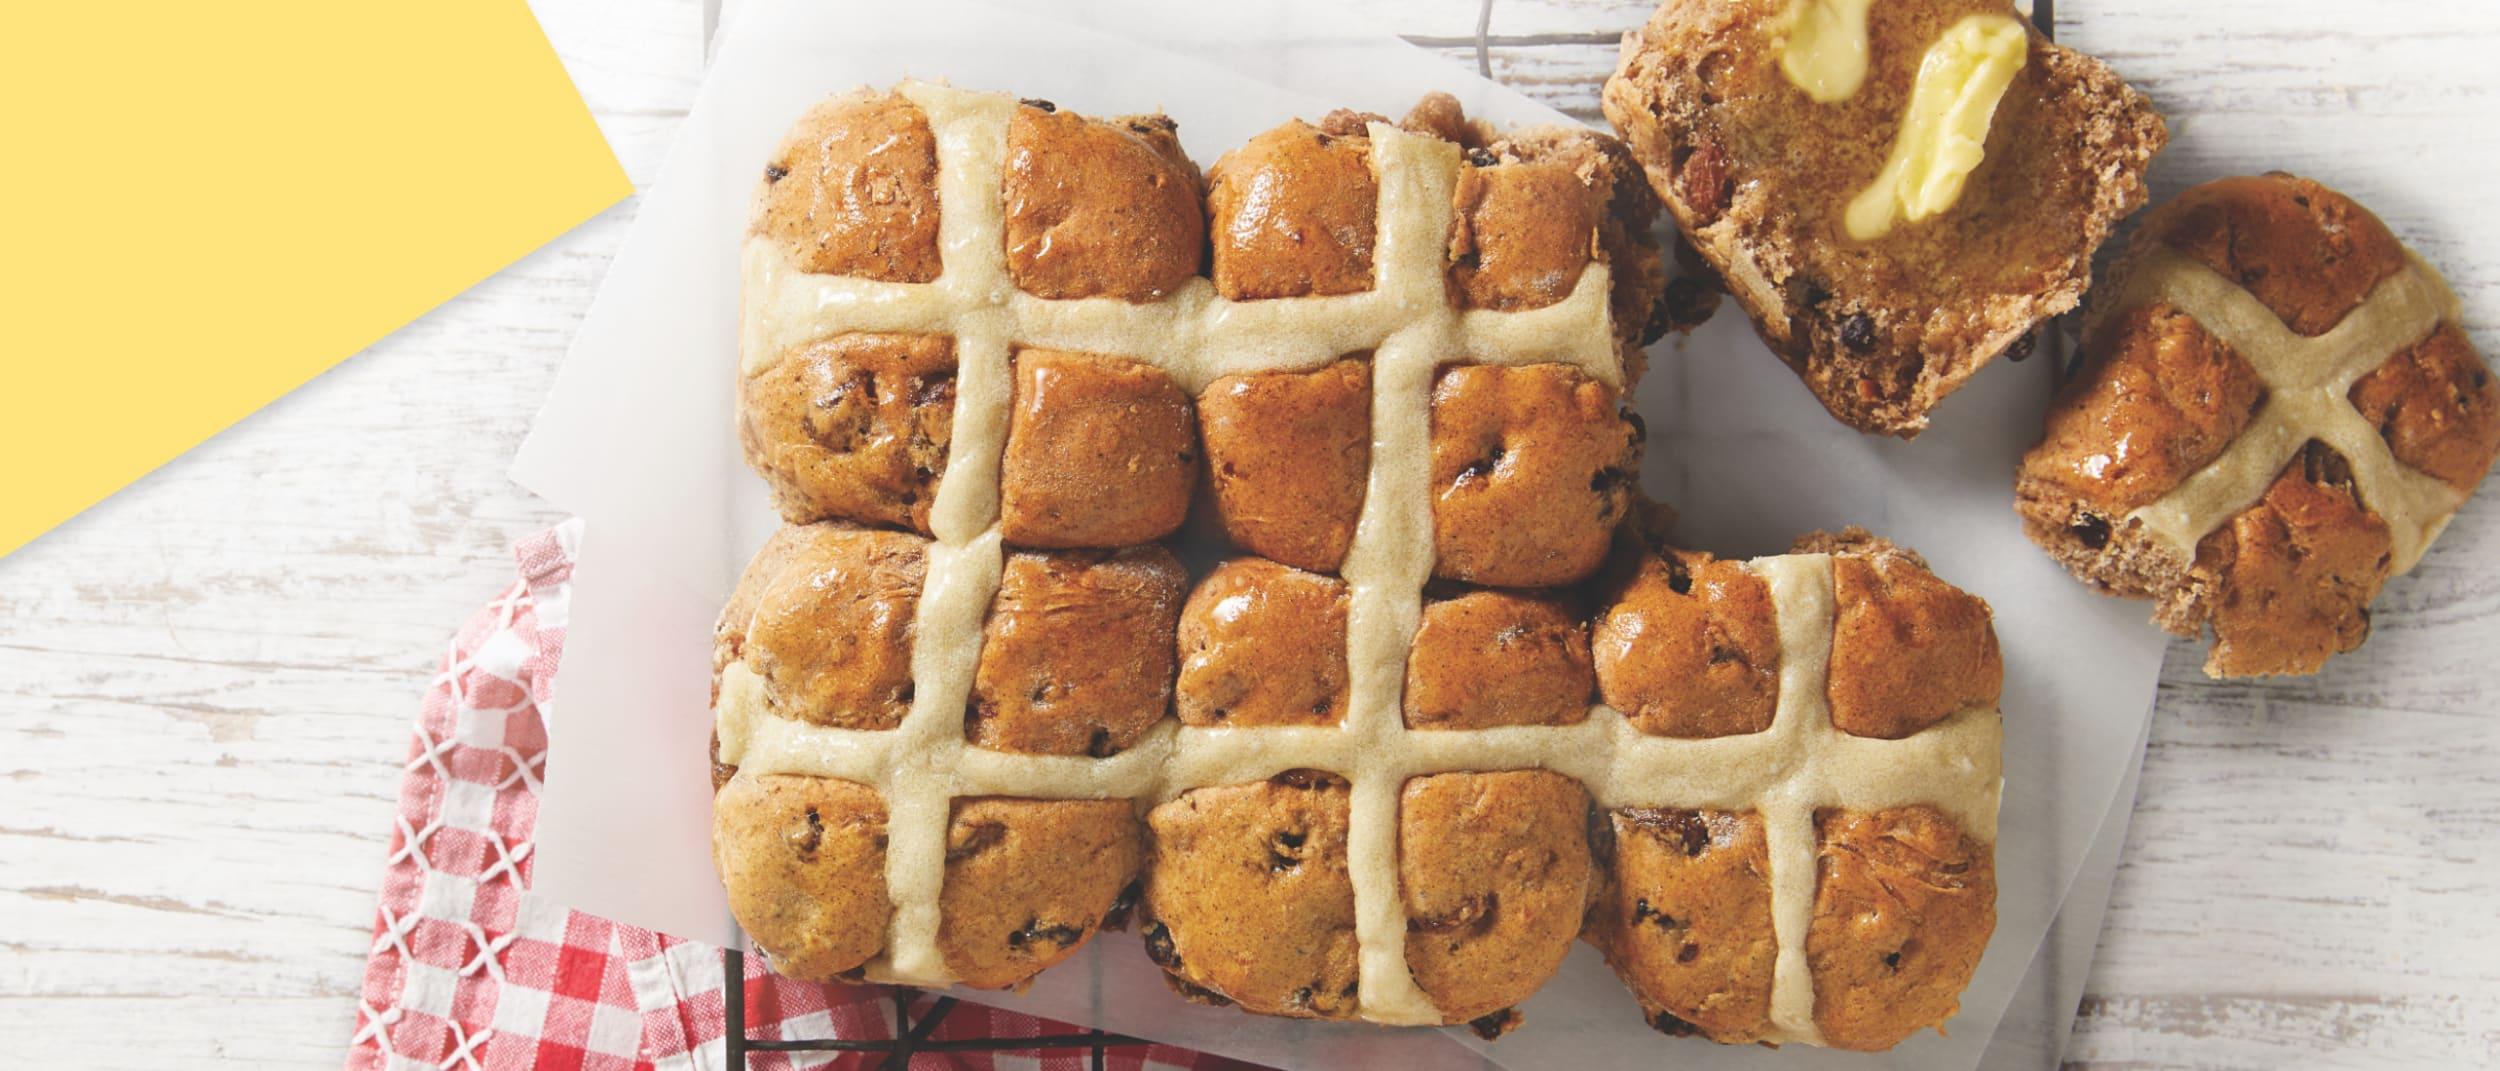 Muffin Break: Hot Cross Scones